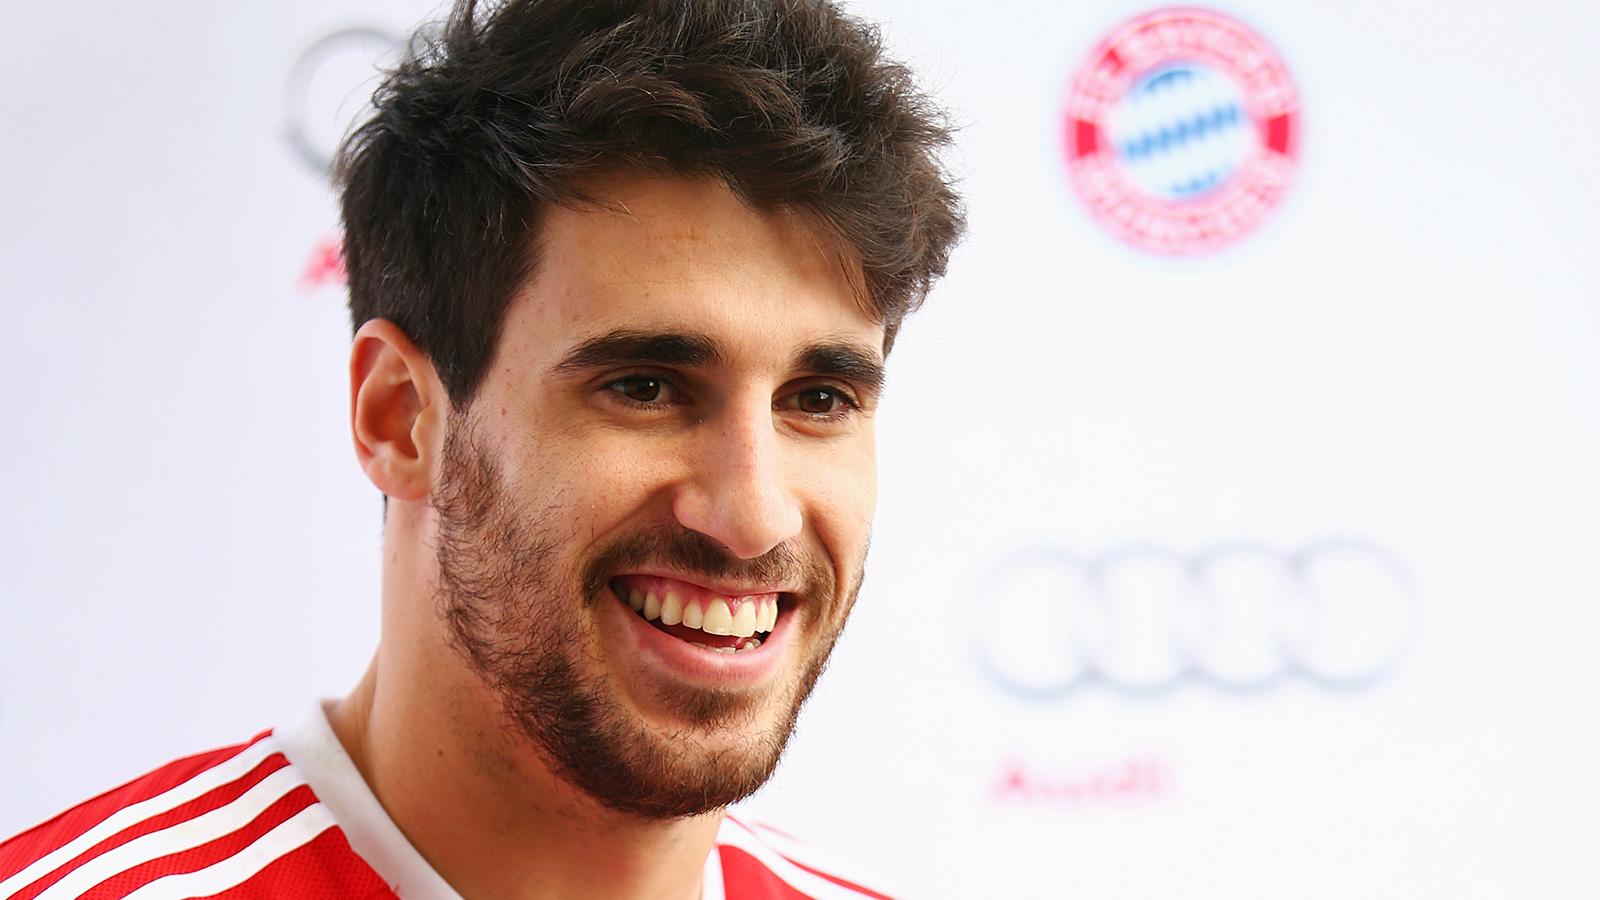 Bayern Munich's Javi Martinez supporting migrants